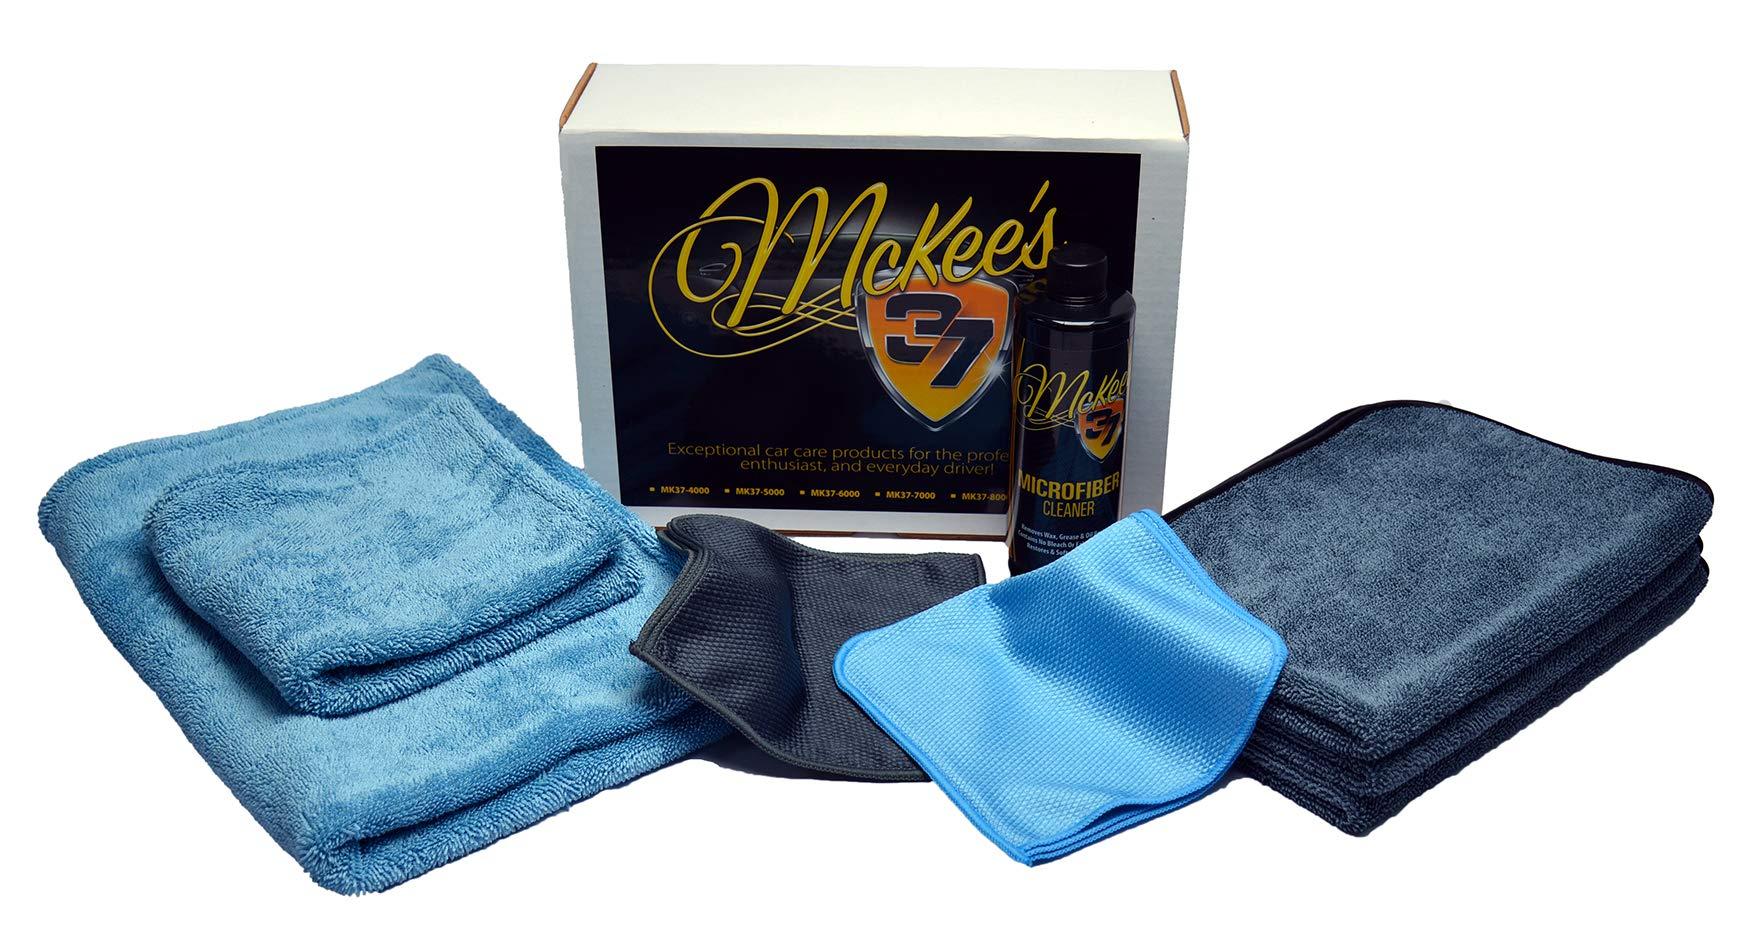 McKee's 37 MK37-CMTK Complete Microfiber Towel Kit 16. Fluid_Ounces